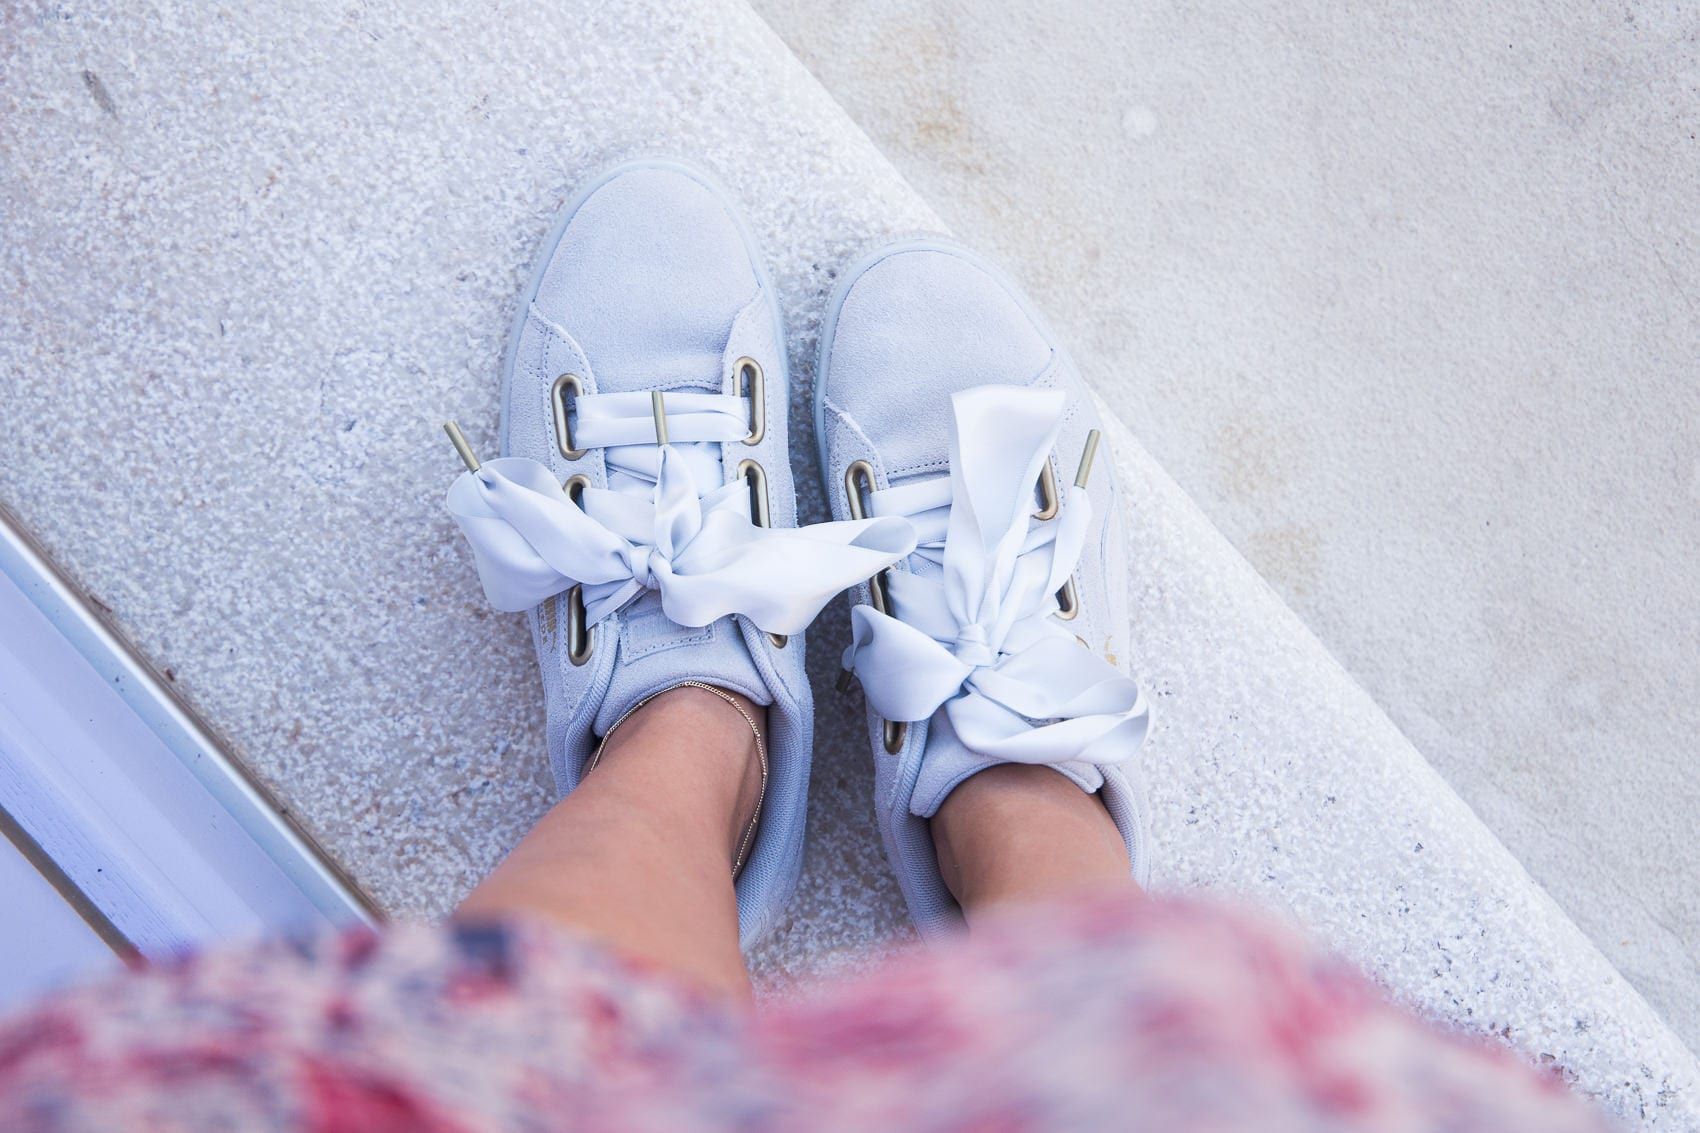 PUMA Basket Heart Suede Sneakers & Bandeaukleid in Mali Lošinj